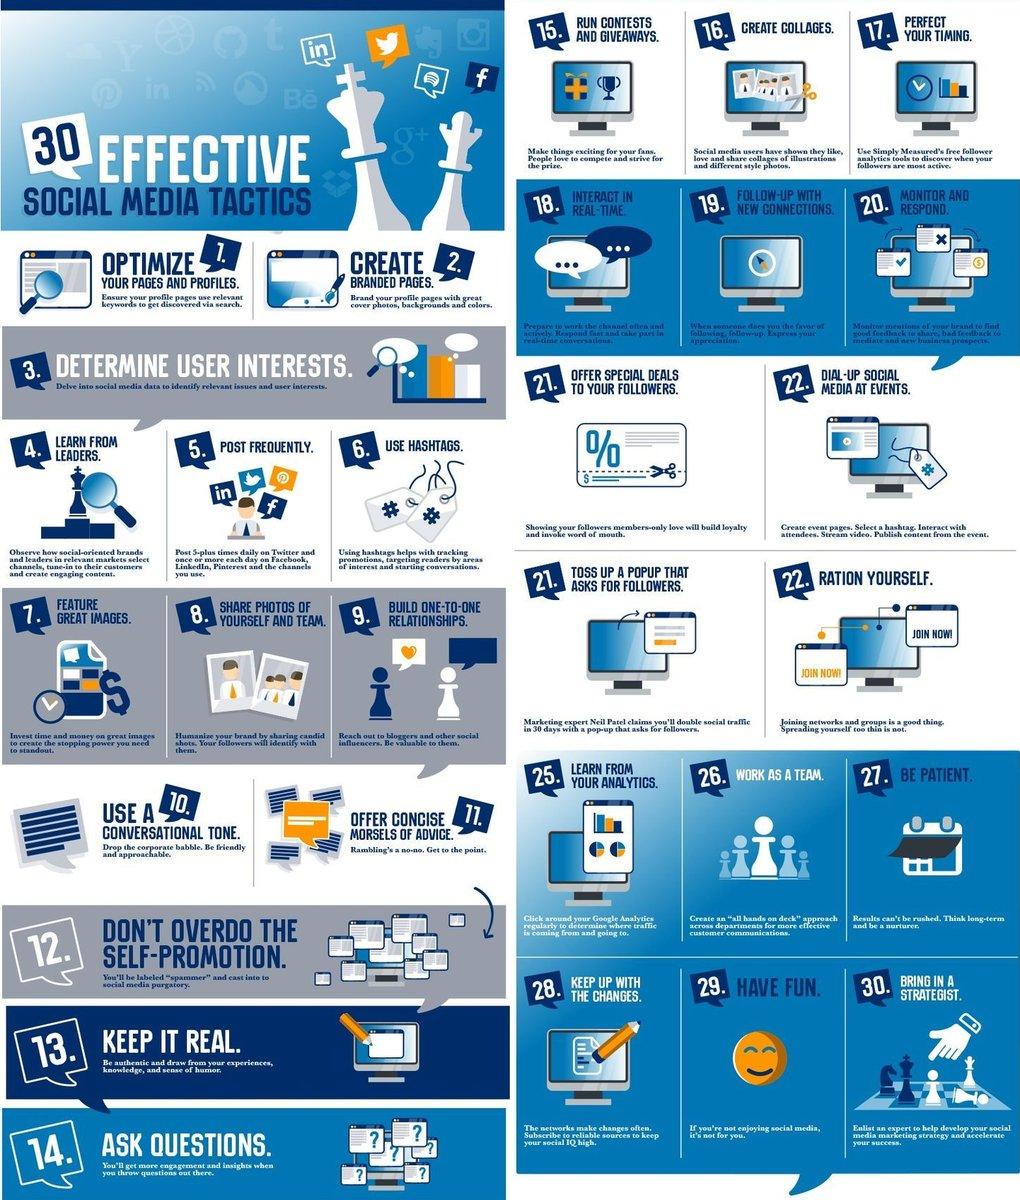 #Socialmedia tactics #DigitalMarketing #9and9 #Internetmarketing #SMM #Mpgvip #defstar5 #makeyourownlane #Growthhacking #OnlineMarketing<br>http://pic.twitter.com/SqIQEAiMKN